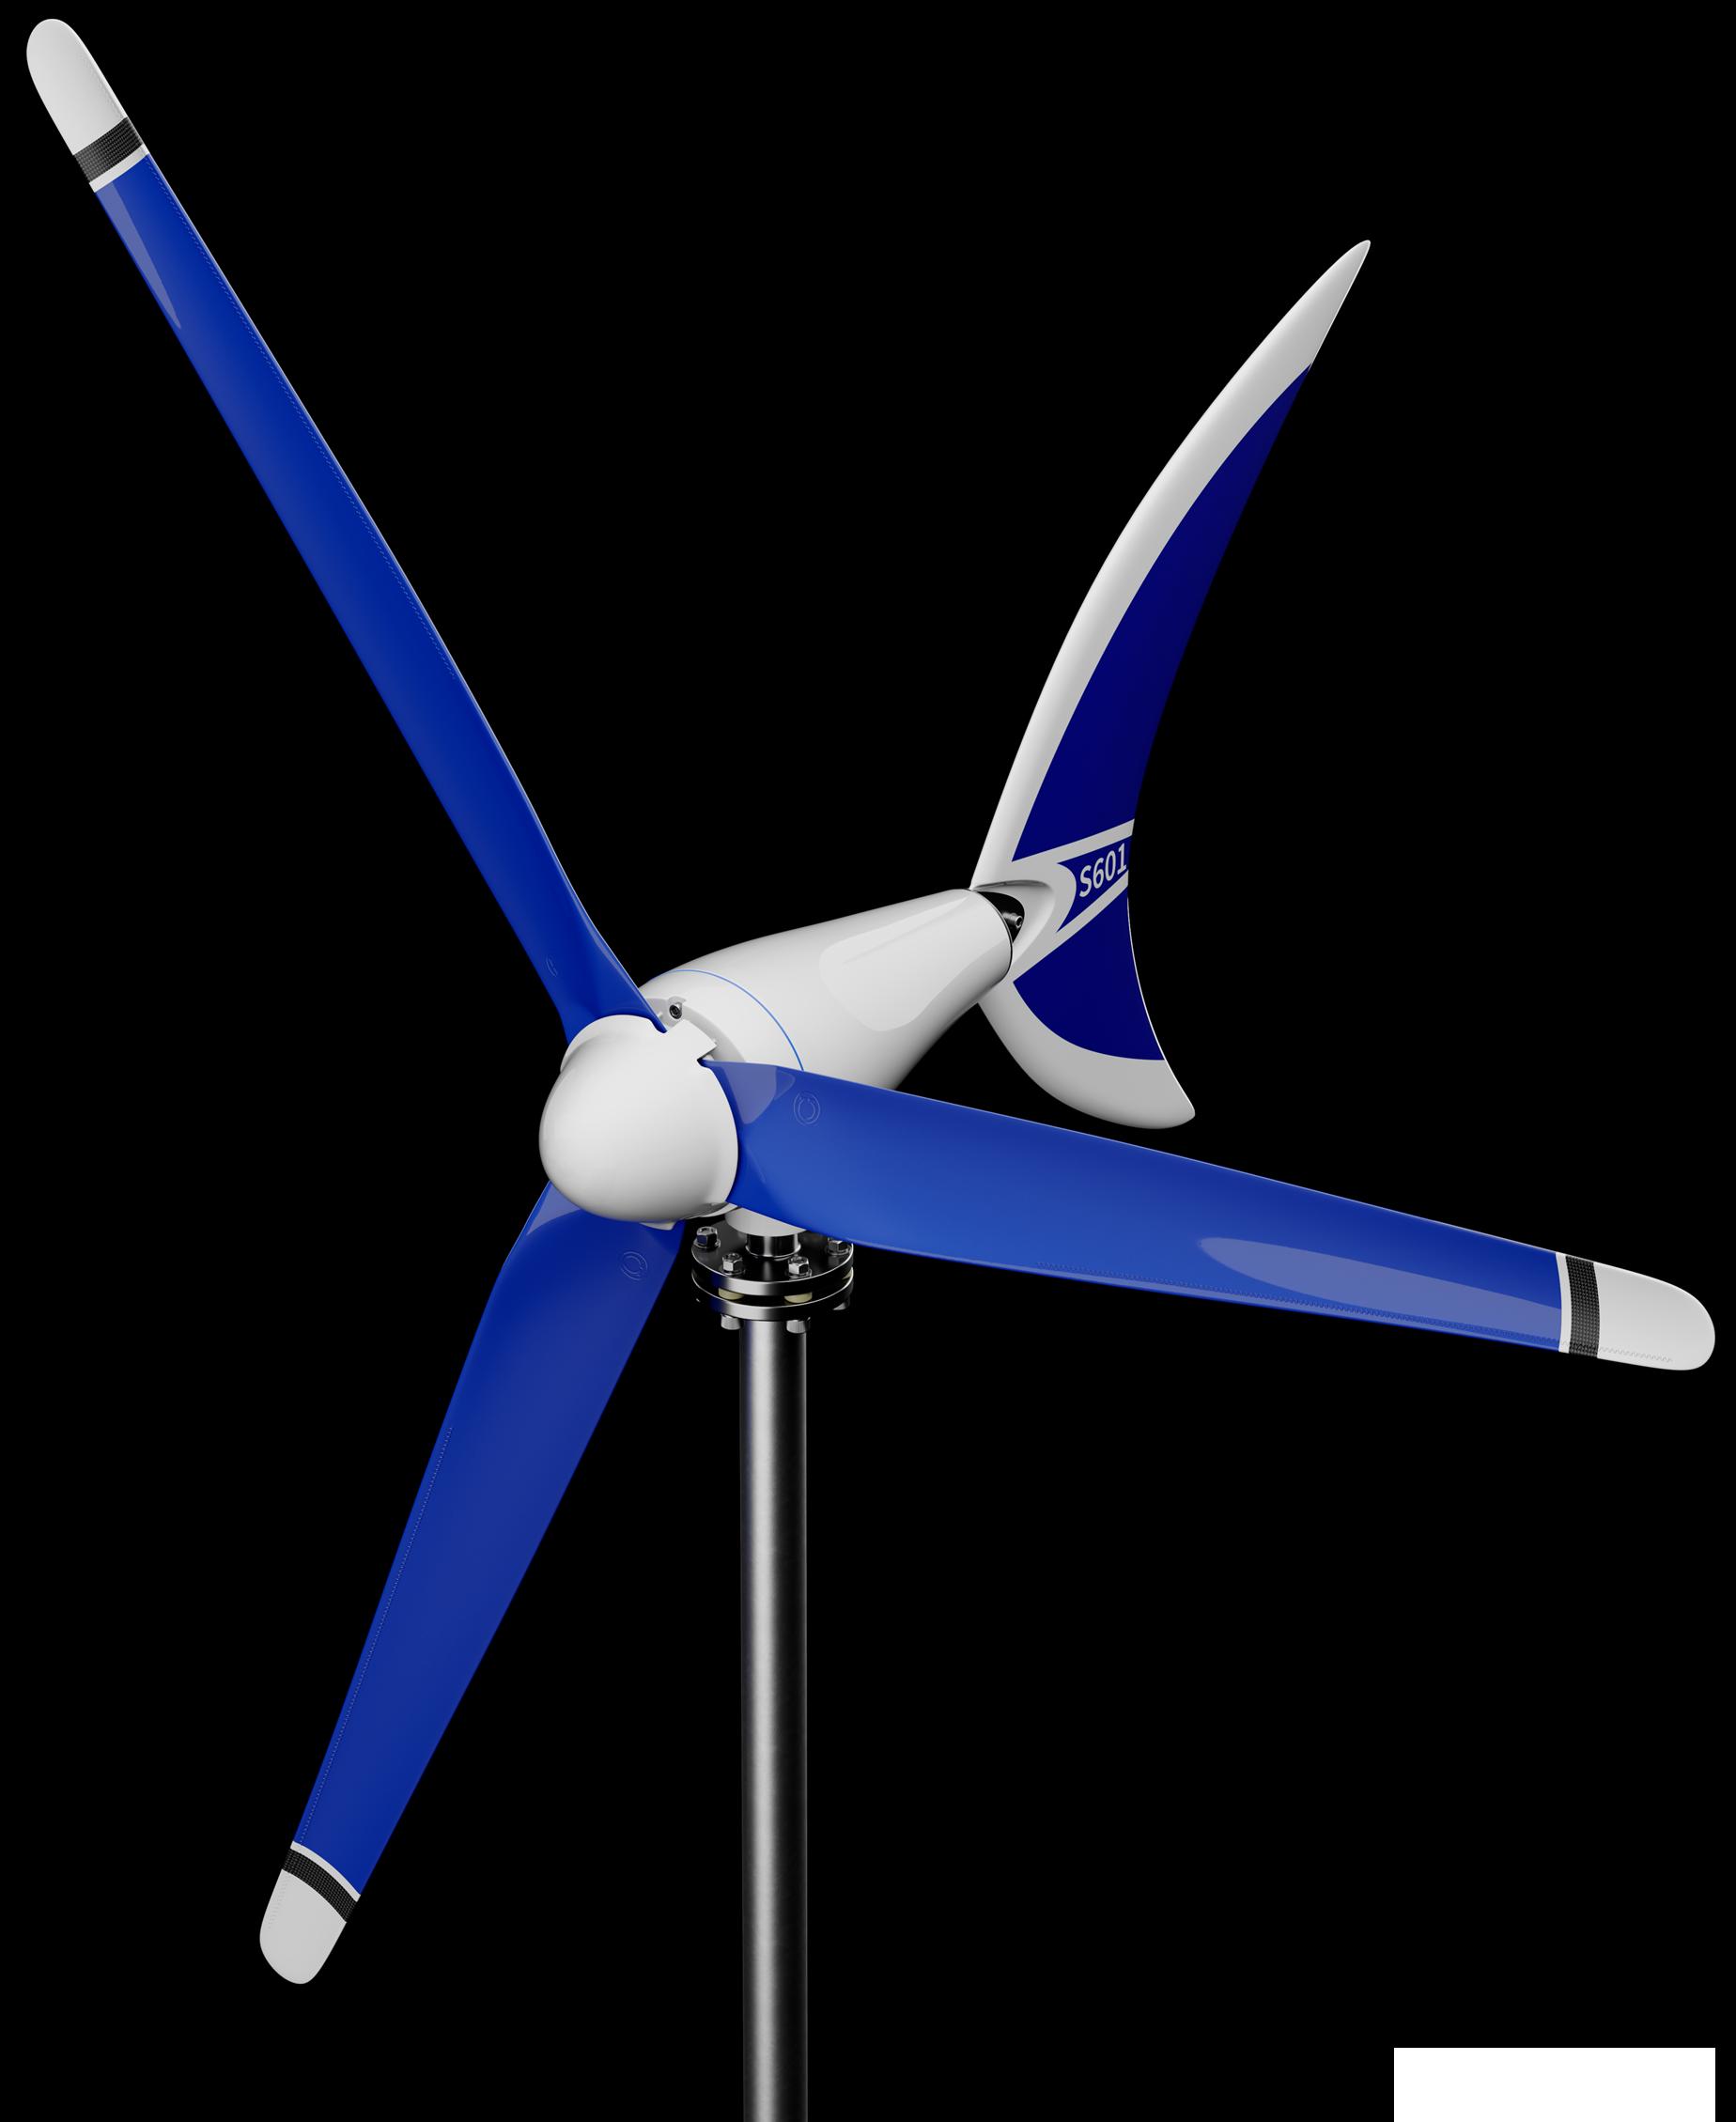 Spreco Windgenerator S601